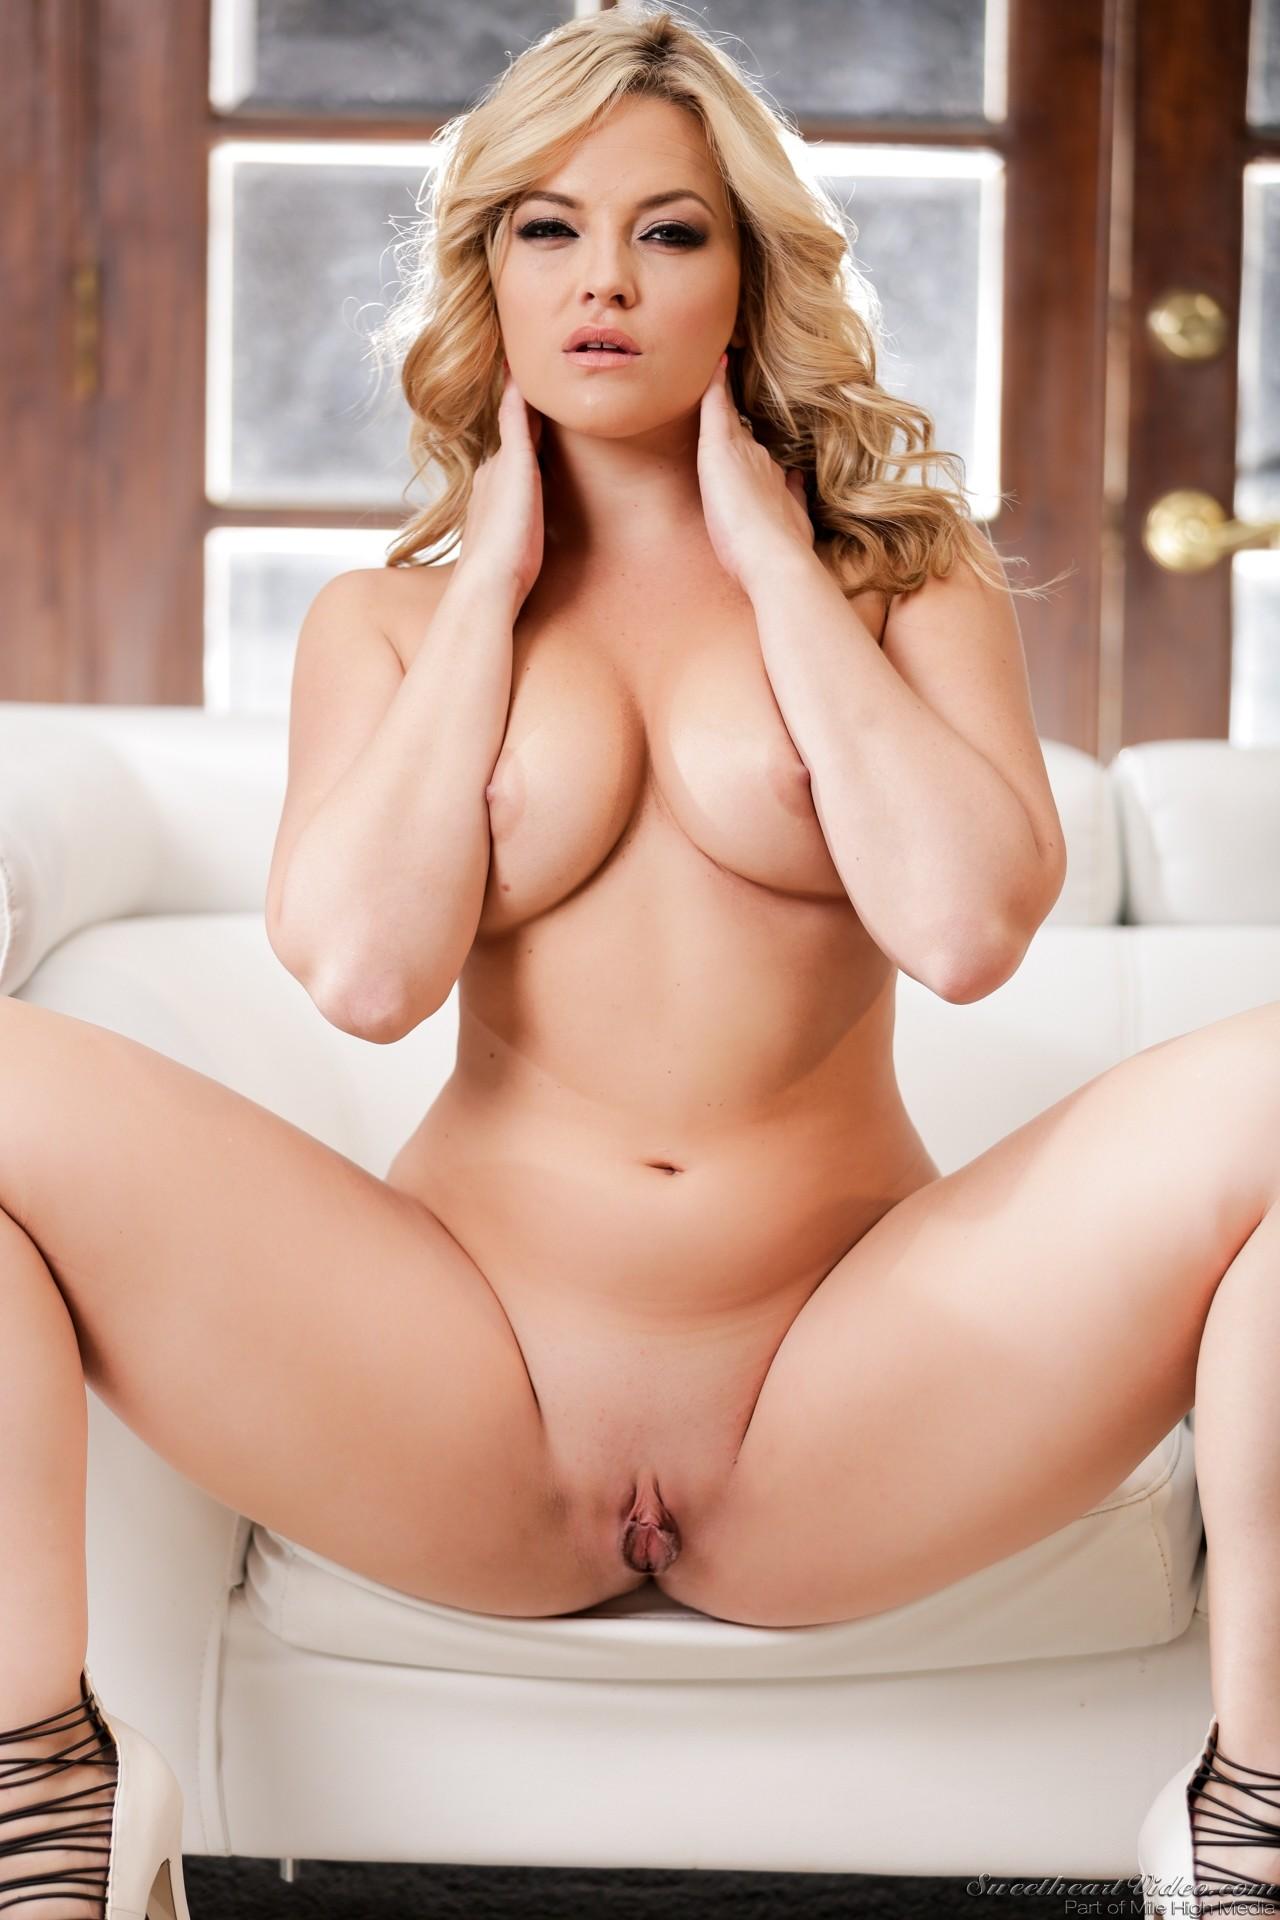 Naked women from east texas, ninja sex porn